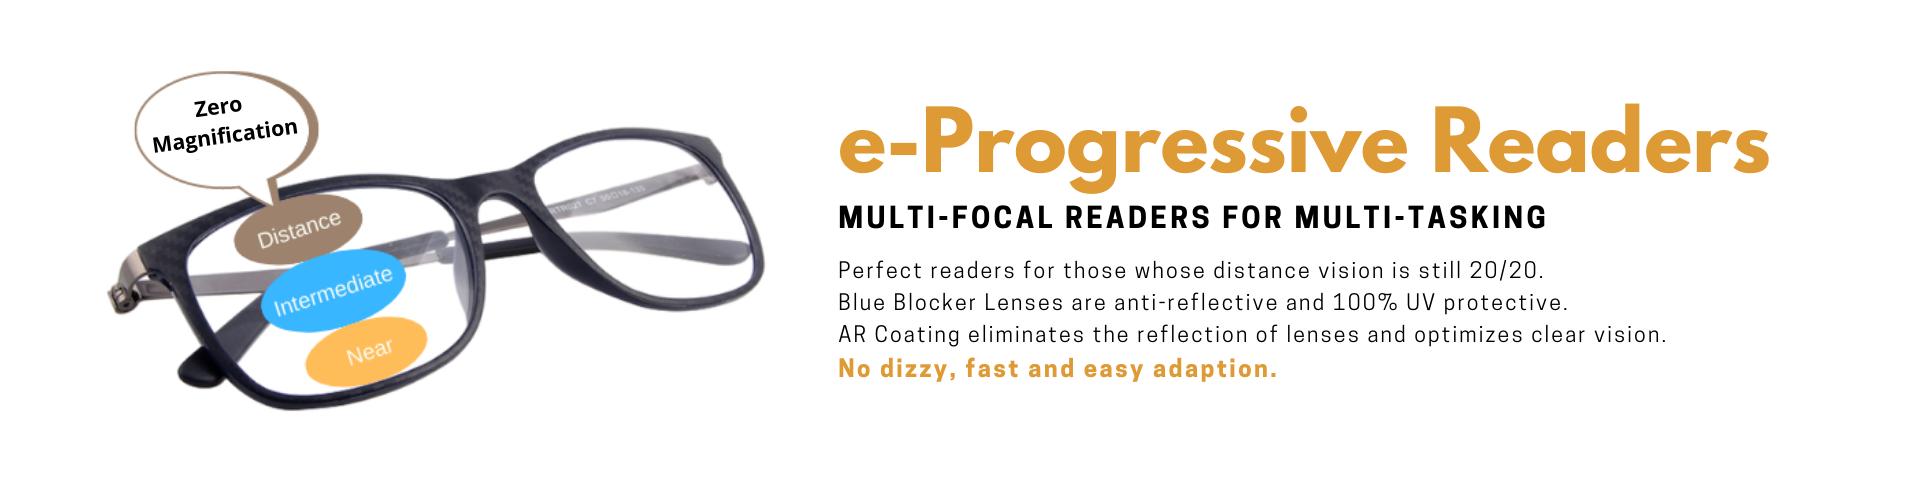 e-Progressive Readers 漸進老花眼鏡